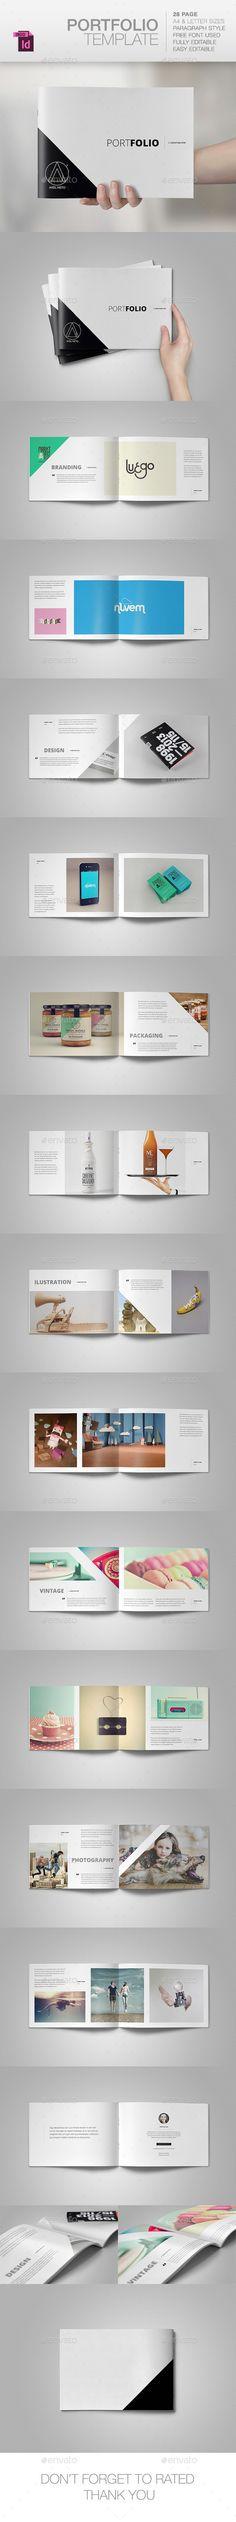 Portfolio Brochure Template #design Download: http://graphicriver.net/item/portfolio-template/10290456?ref=ksioks